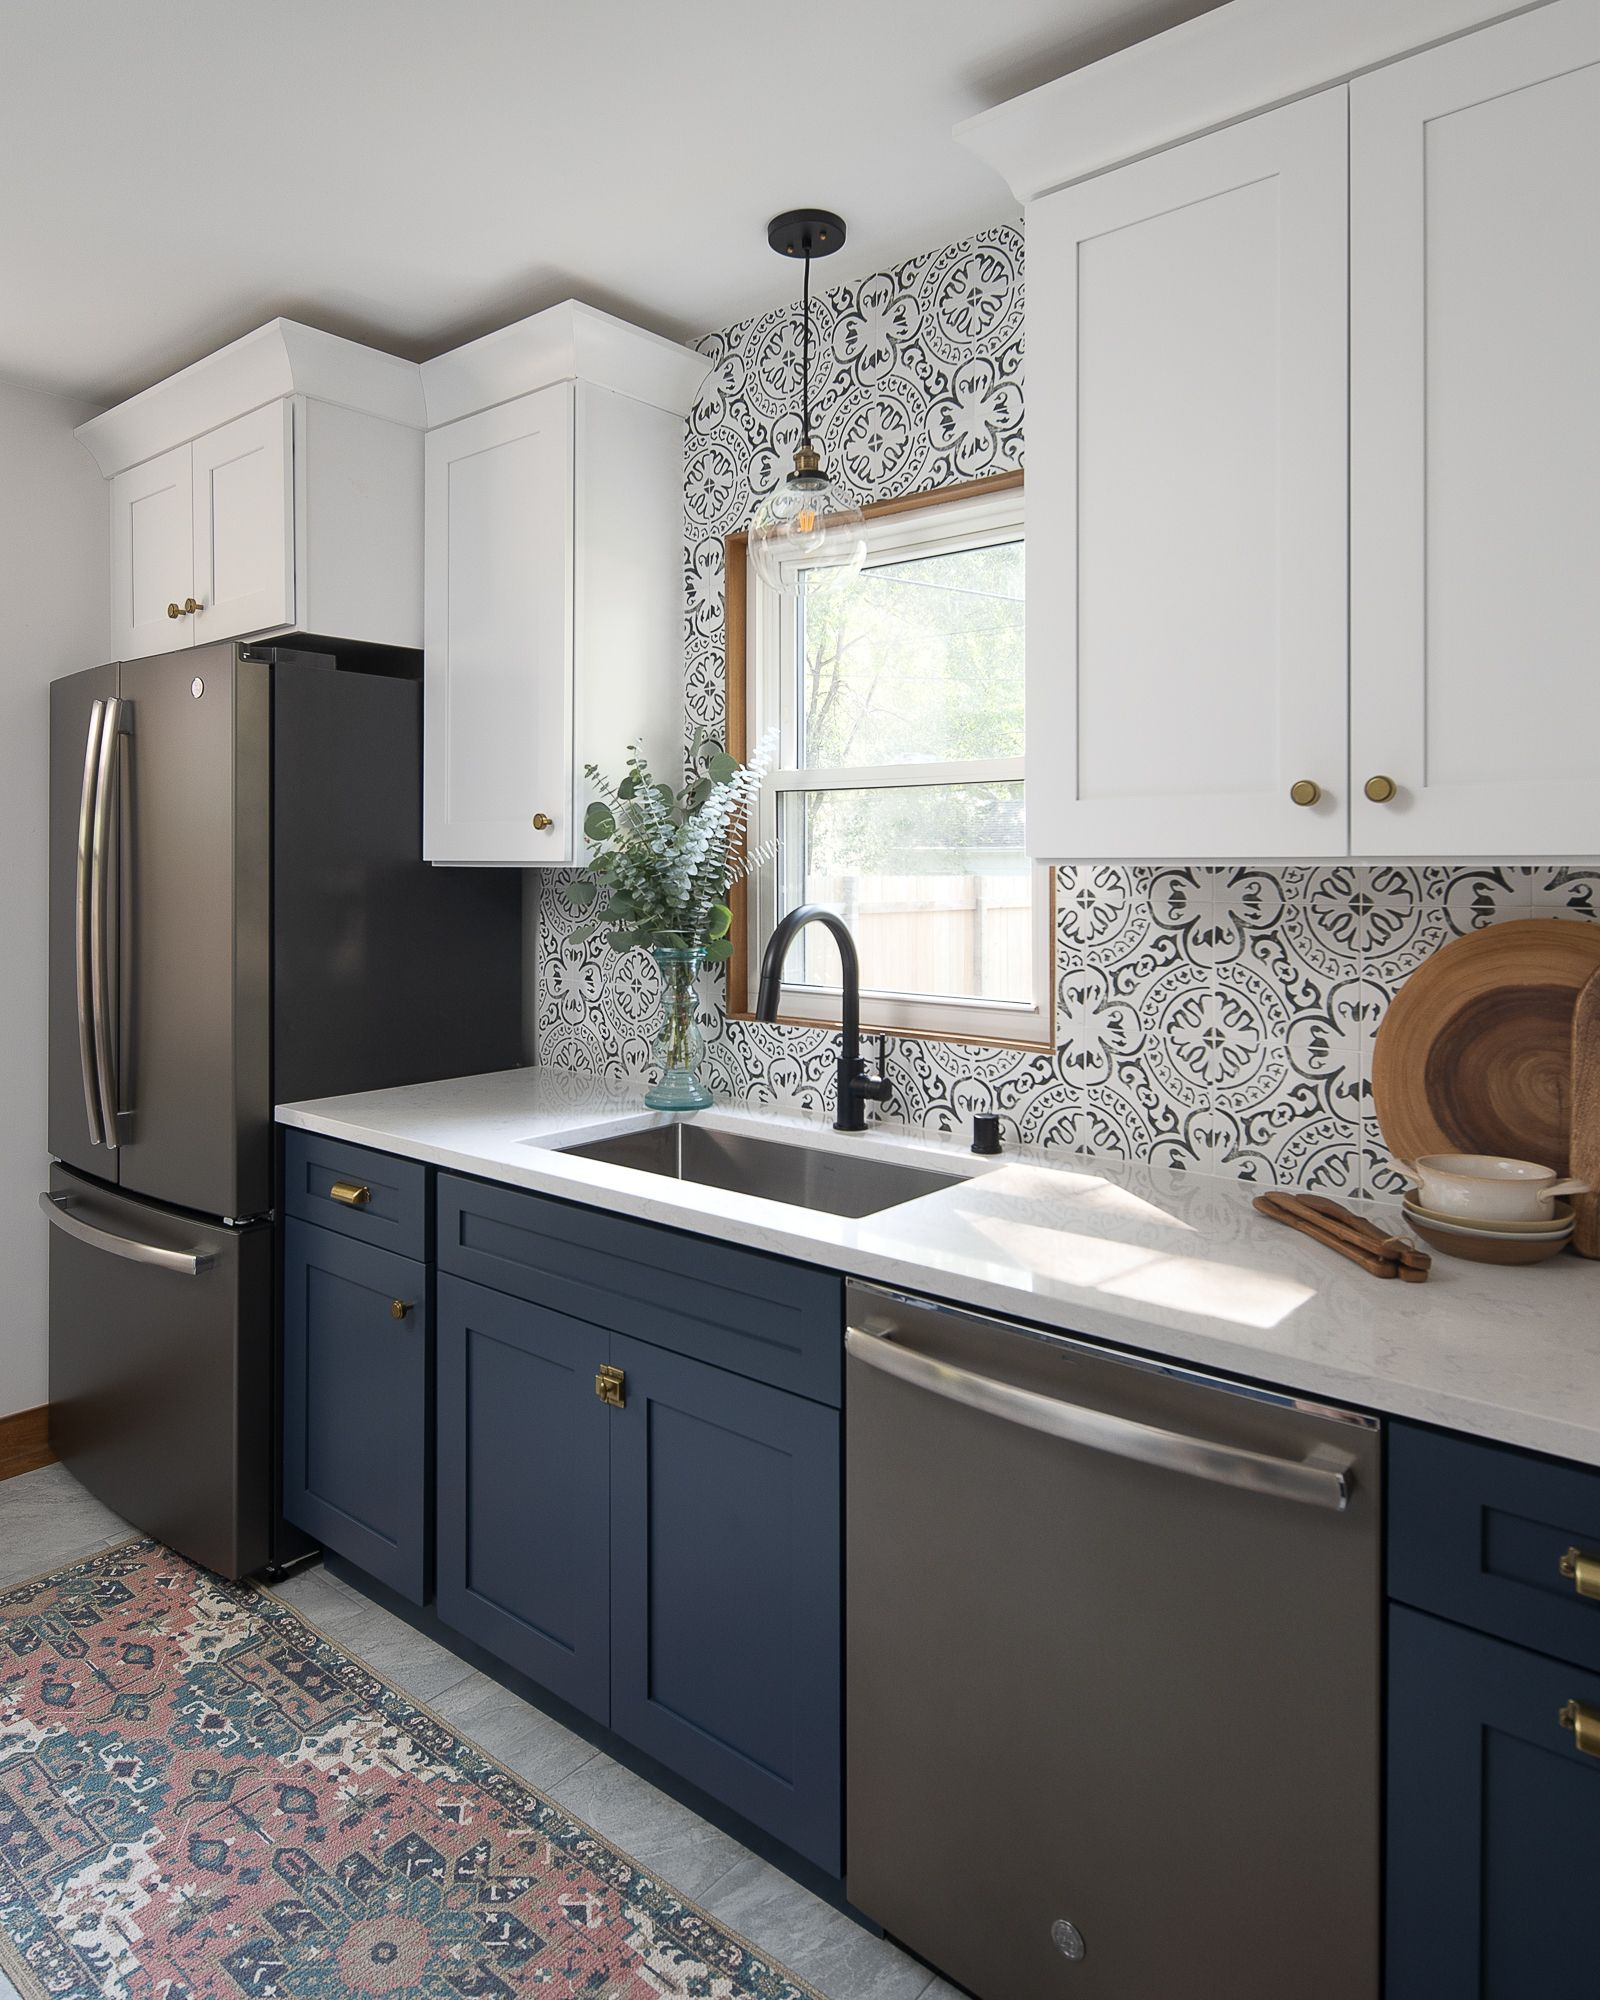 St Louis Park Kitchen Remodel Before After Construction2style Kitchen Backsplash Trends Kitchen Cabinet Trends Kitchen Remodel Small